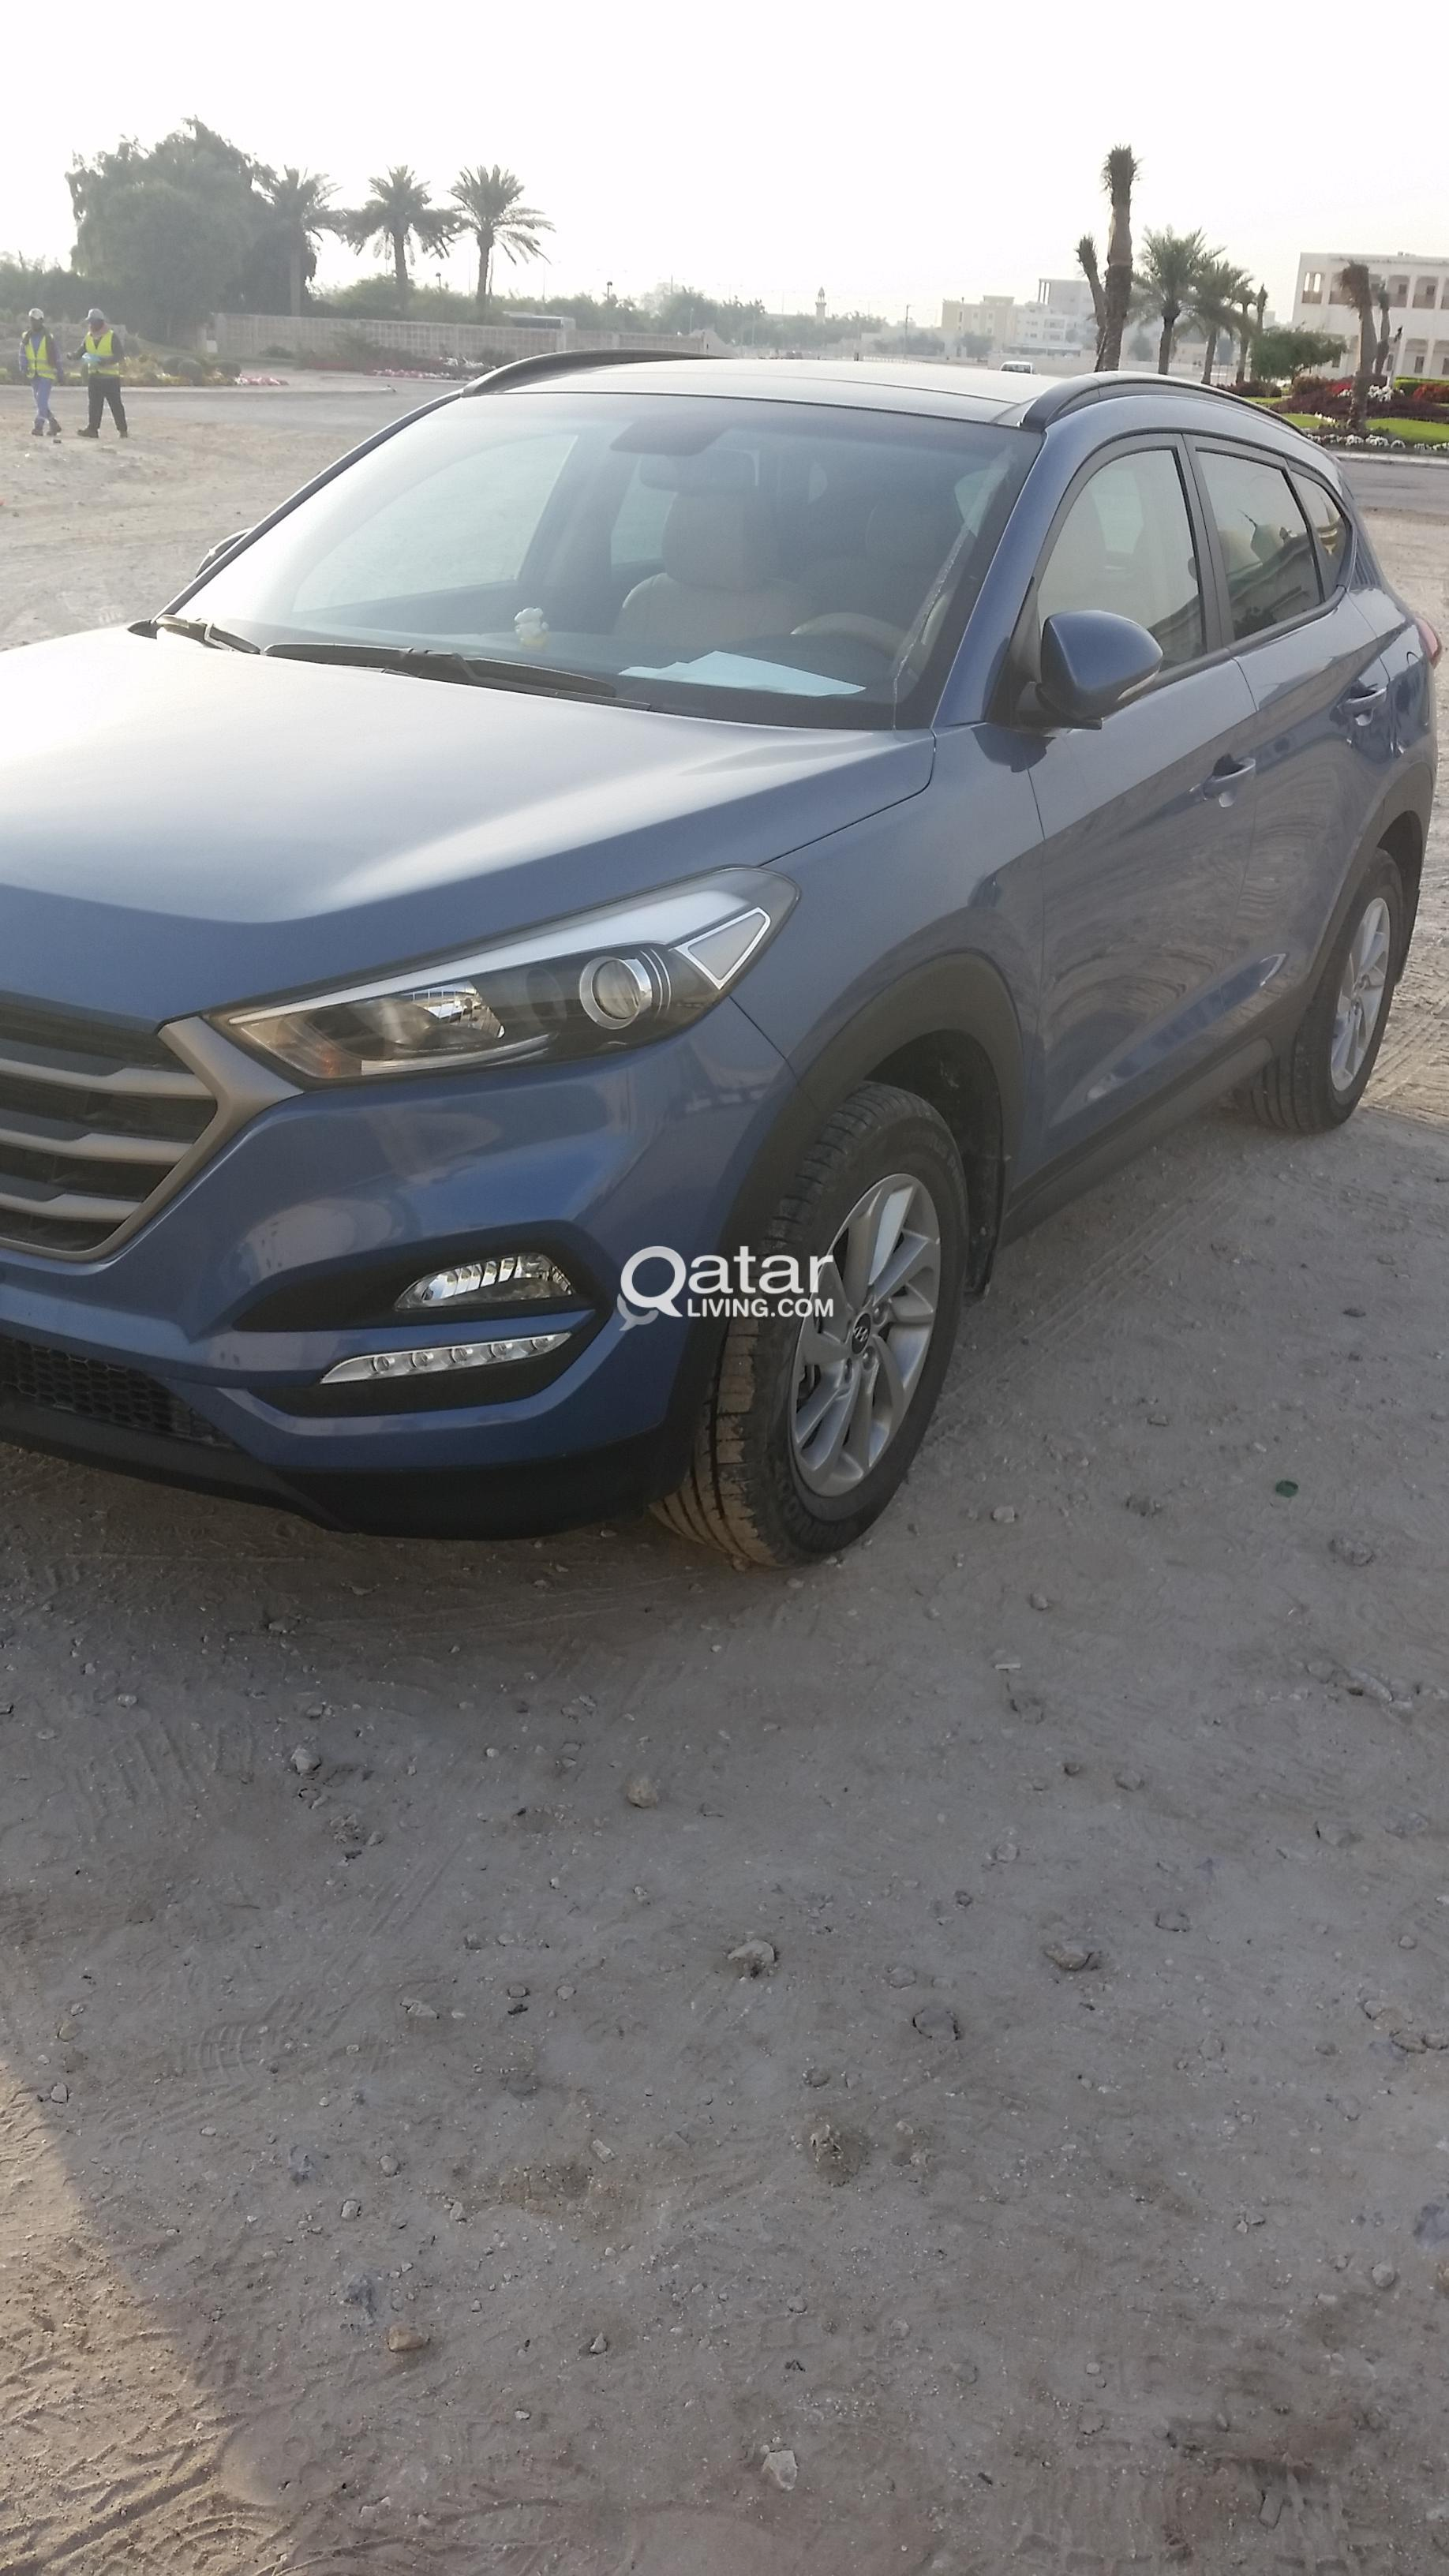 6 month old car sale | Qatar Living